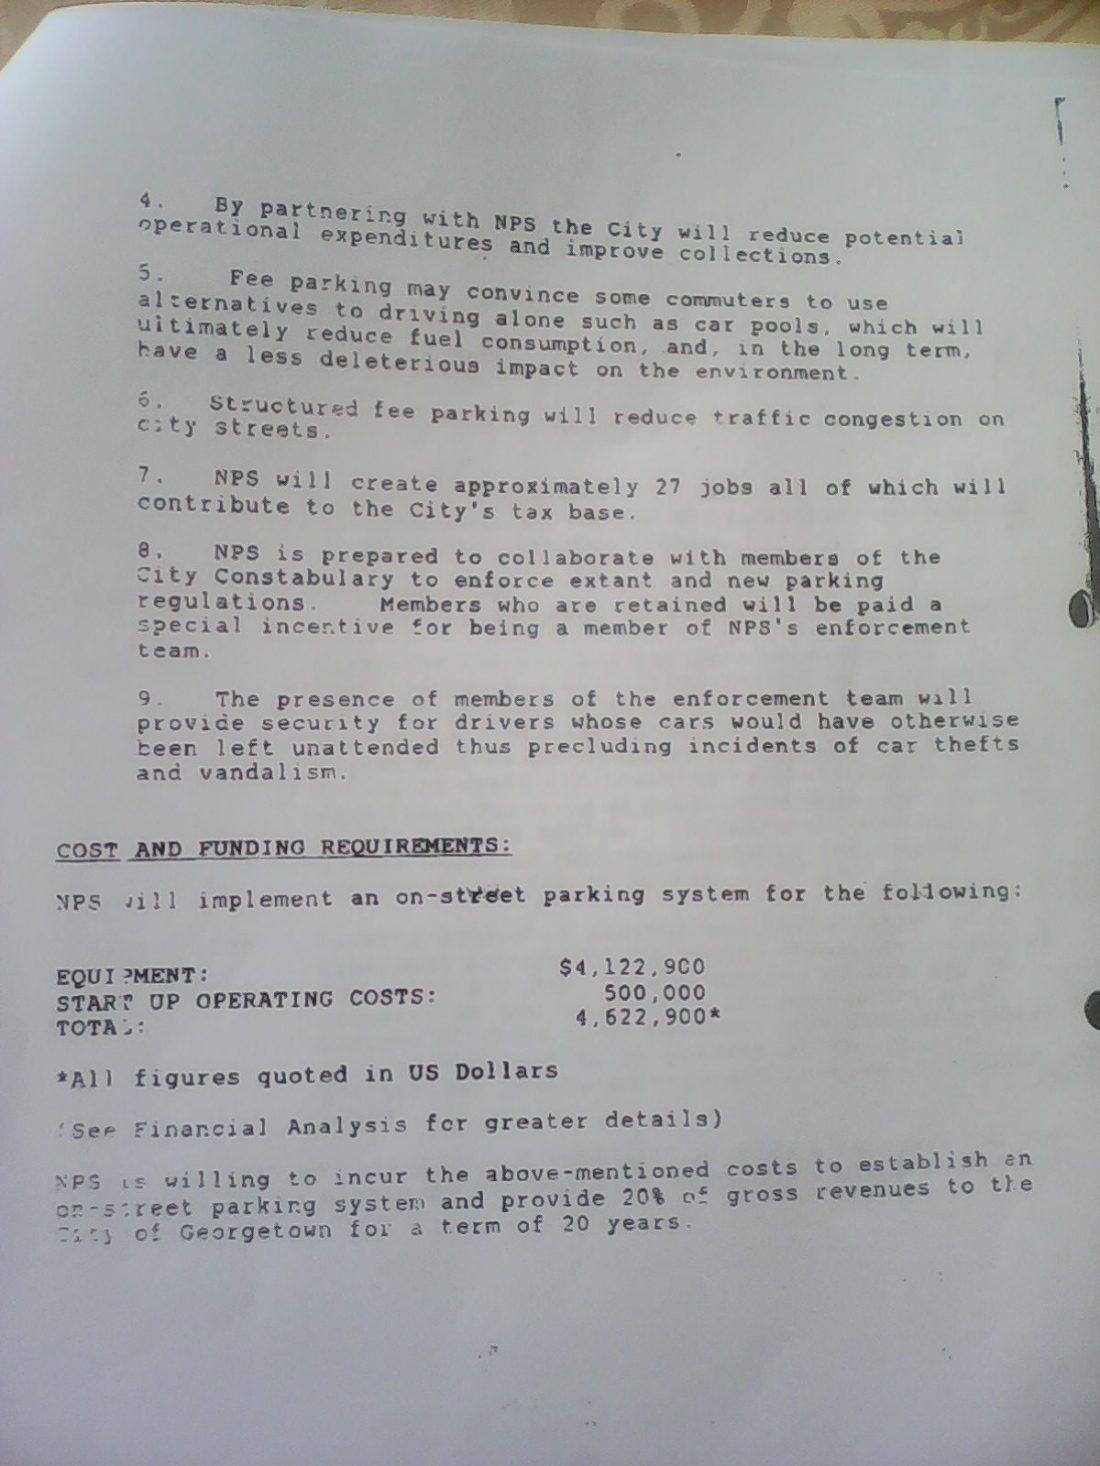 ifa kamau cush proposal to city hall page 4